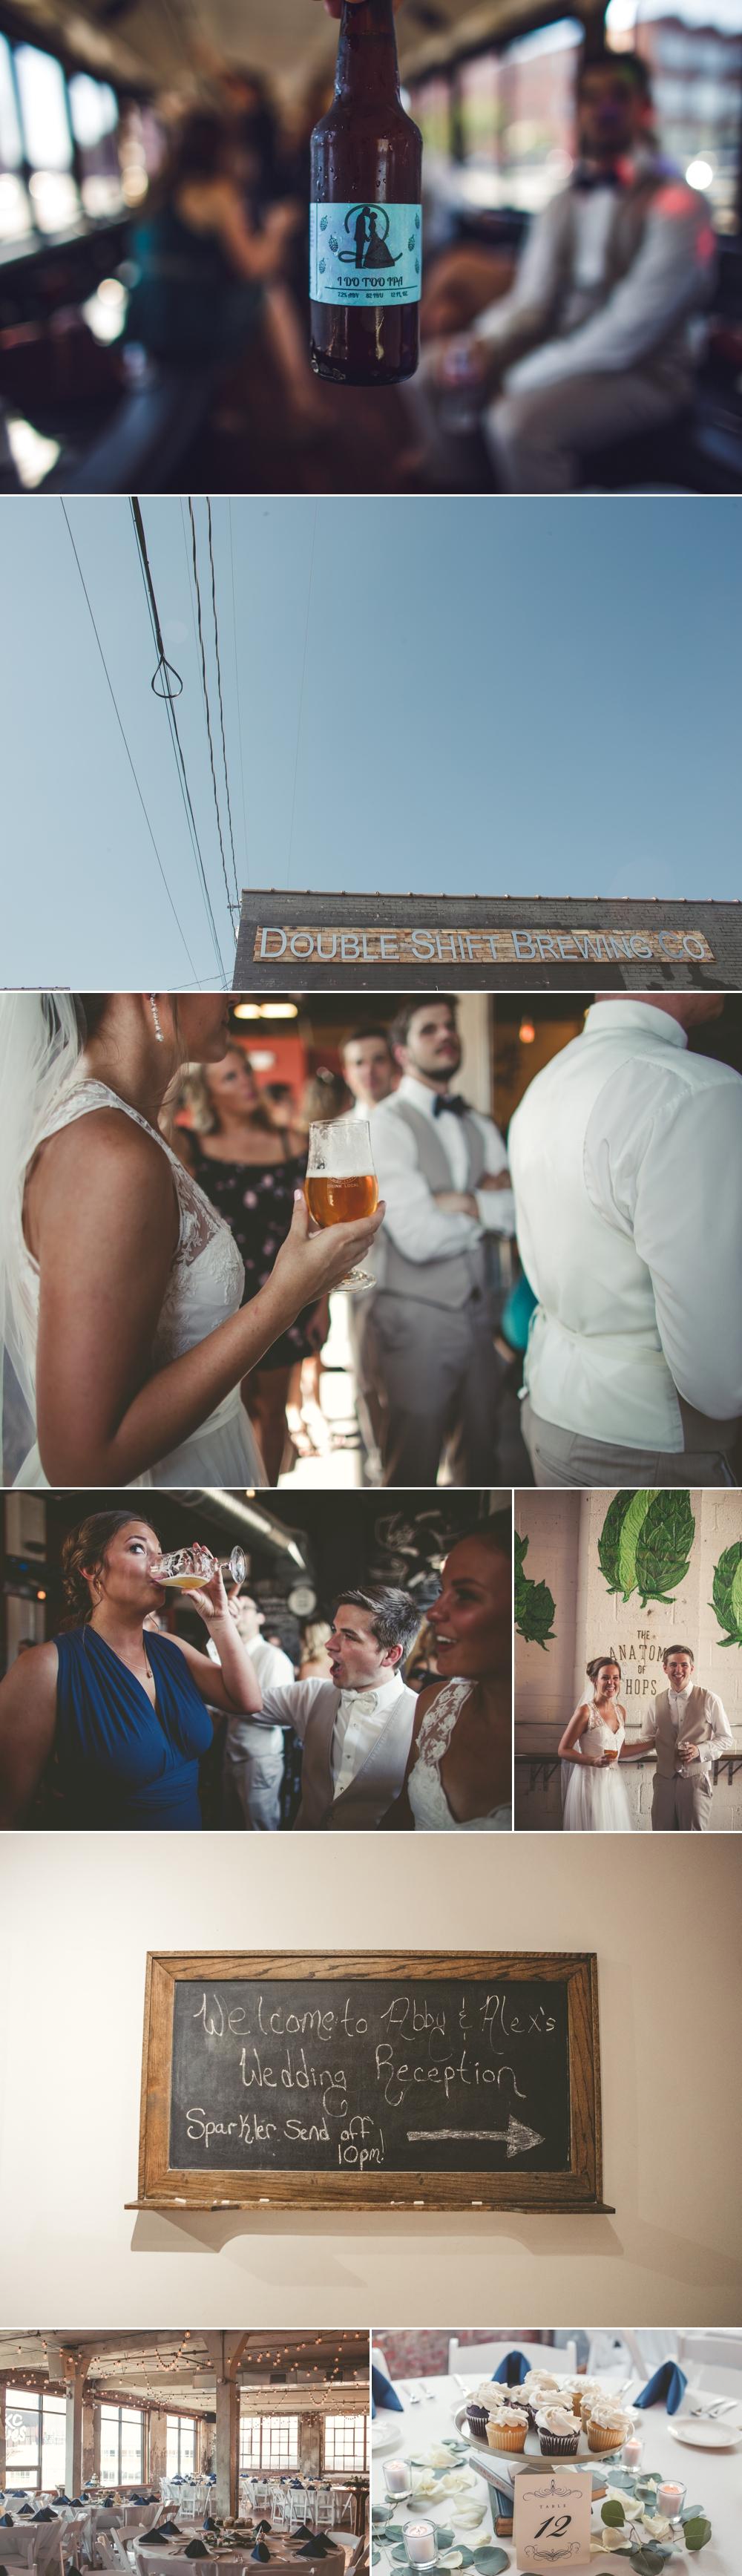 jason_domingues_photography_best_kansas_city_photographer_kc_weddings_bauer_0004.JPG